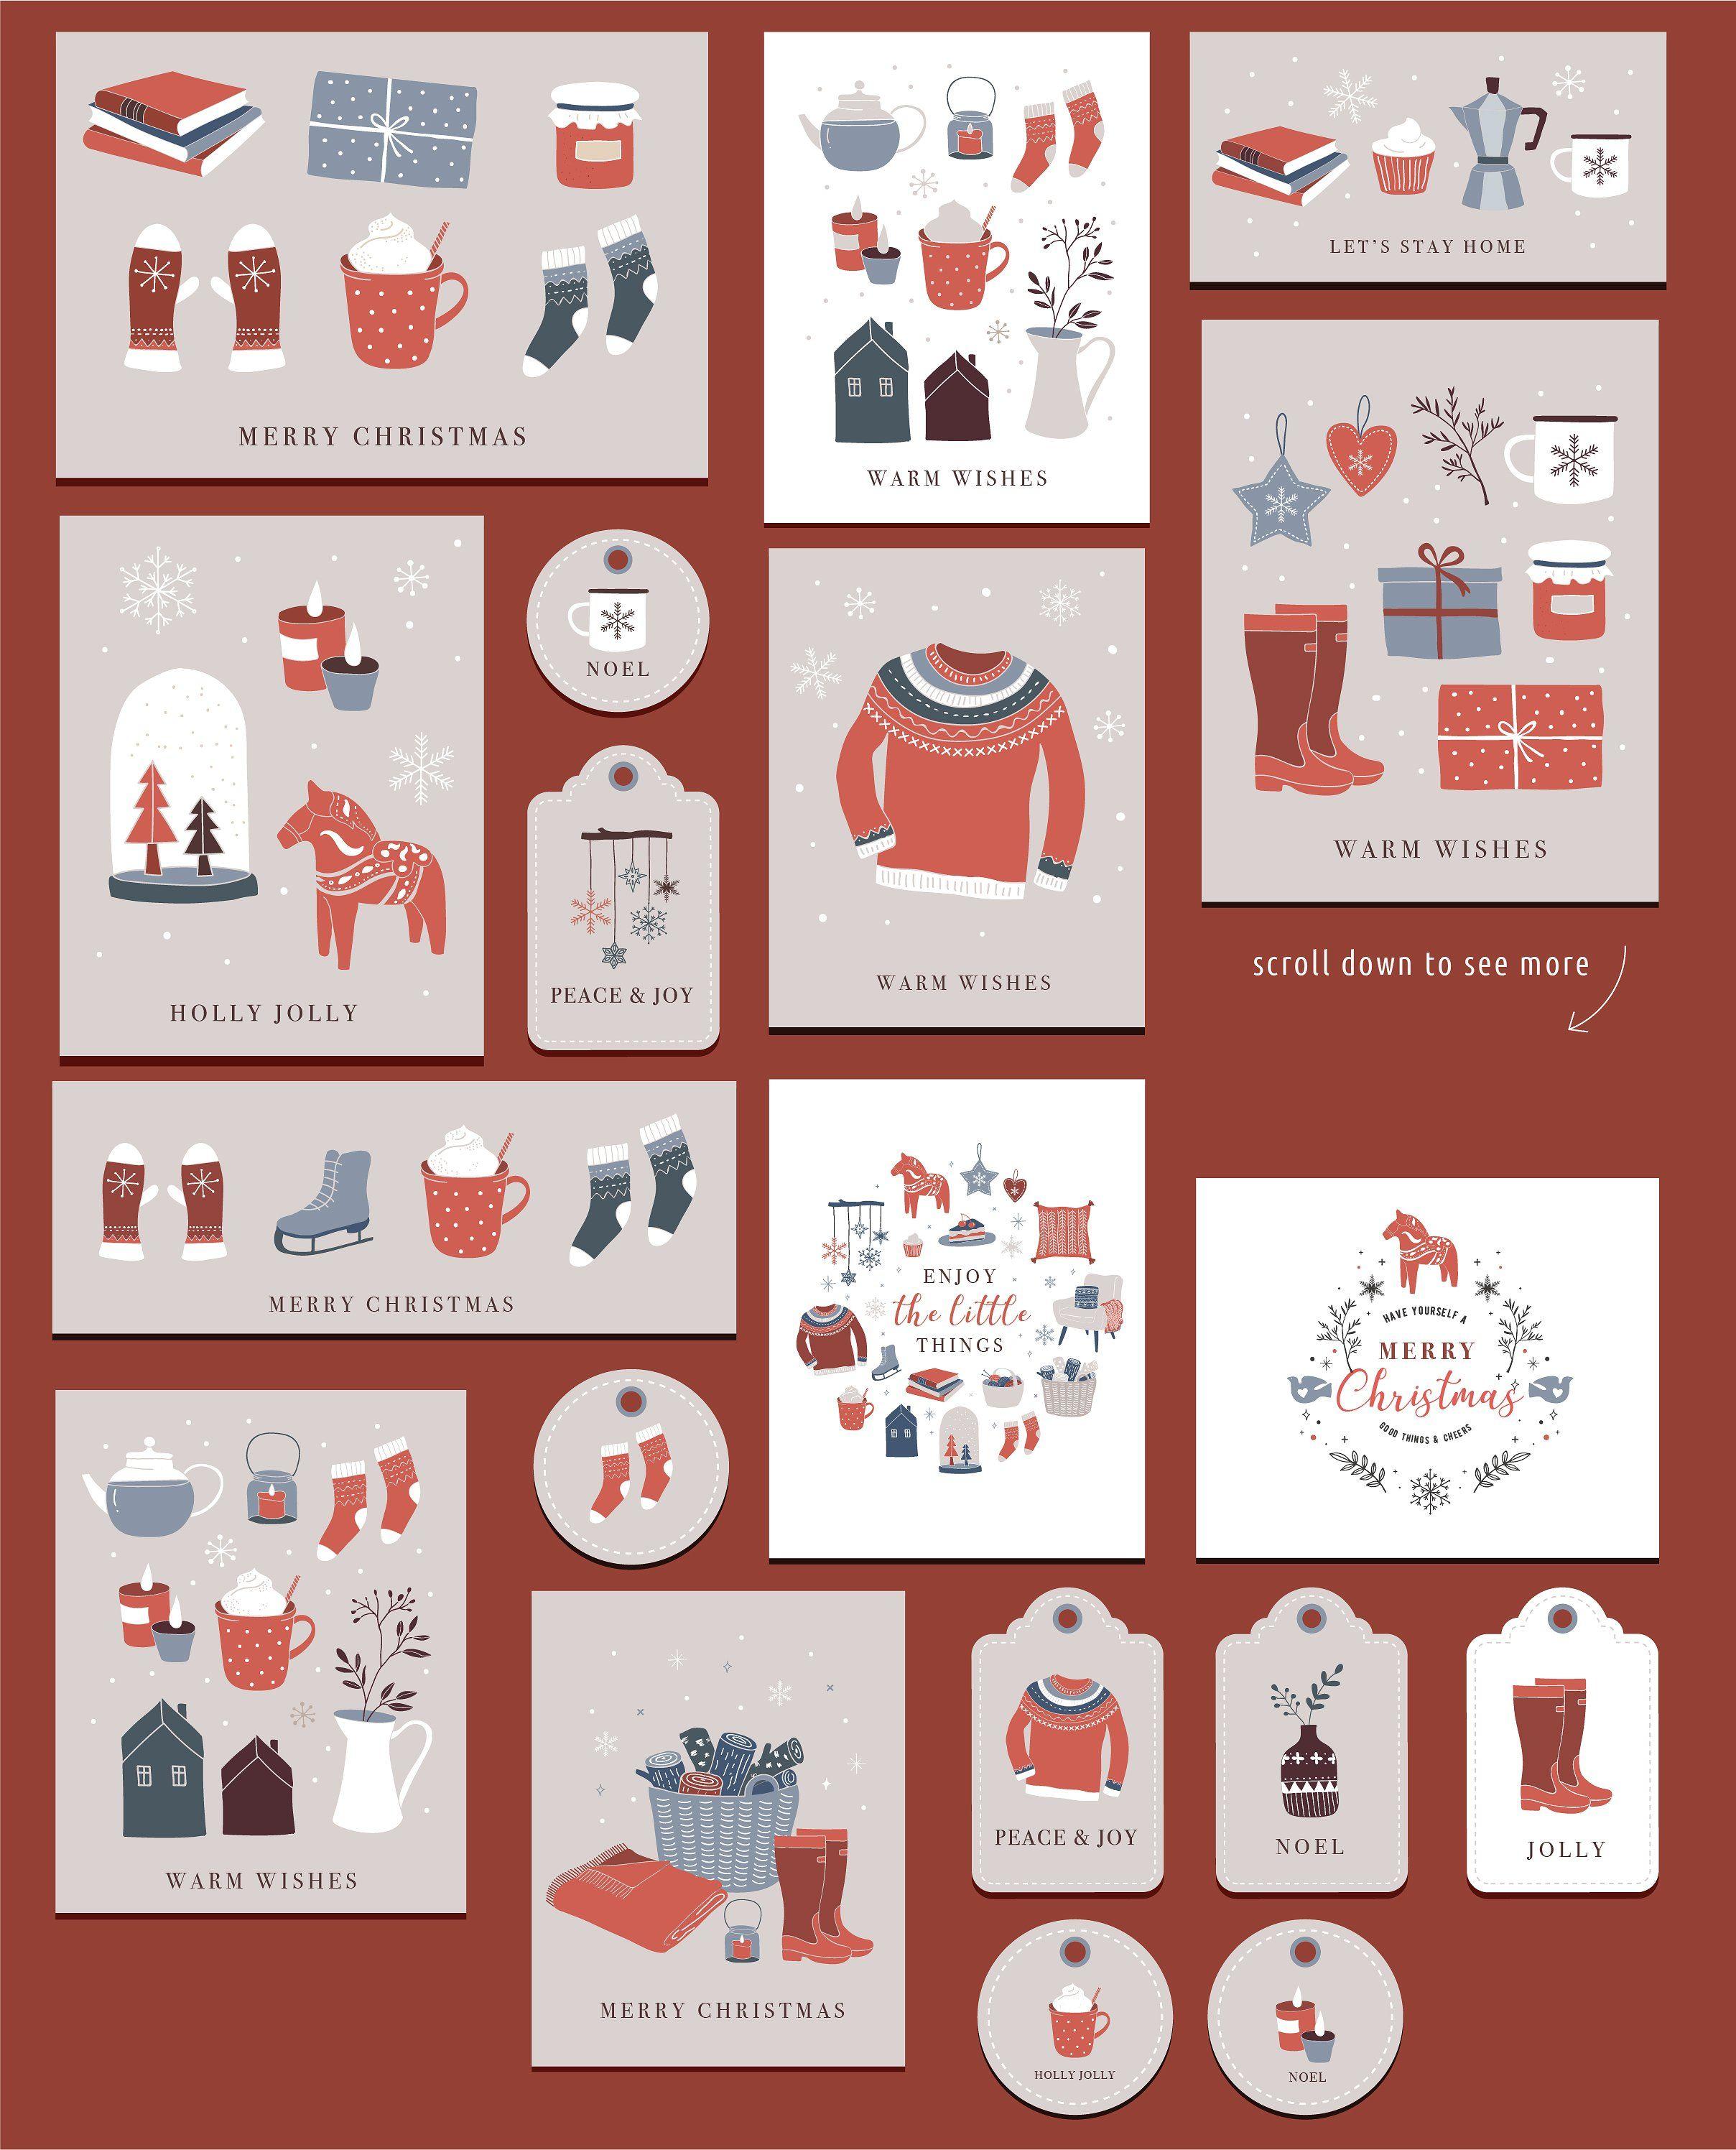 Nordic Christmas - winter collection  Christmas illustration